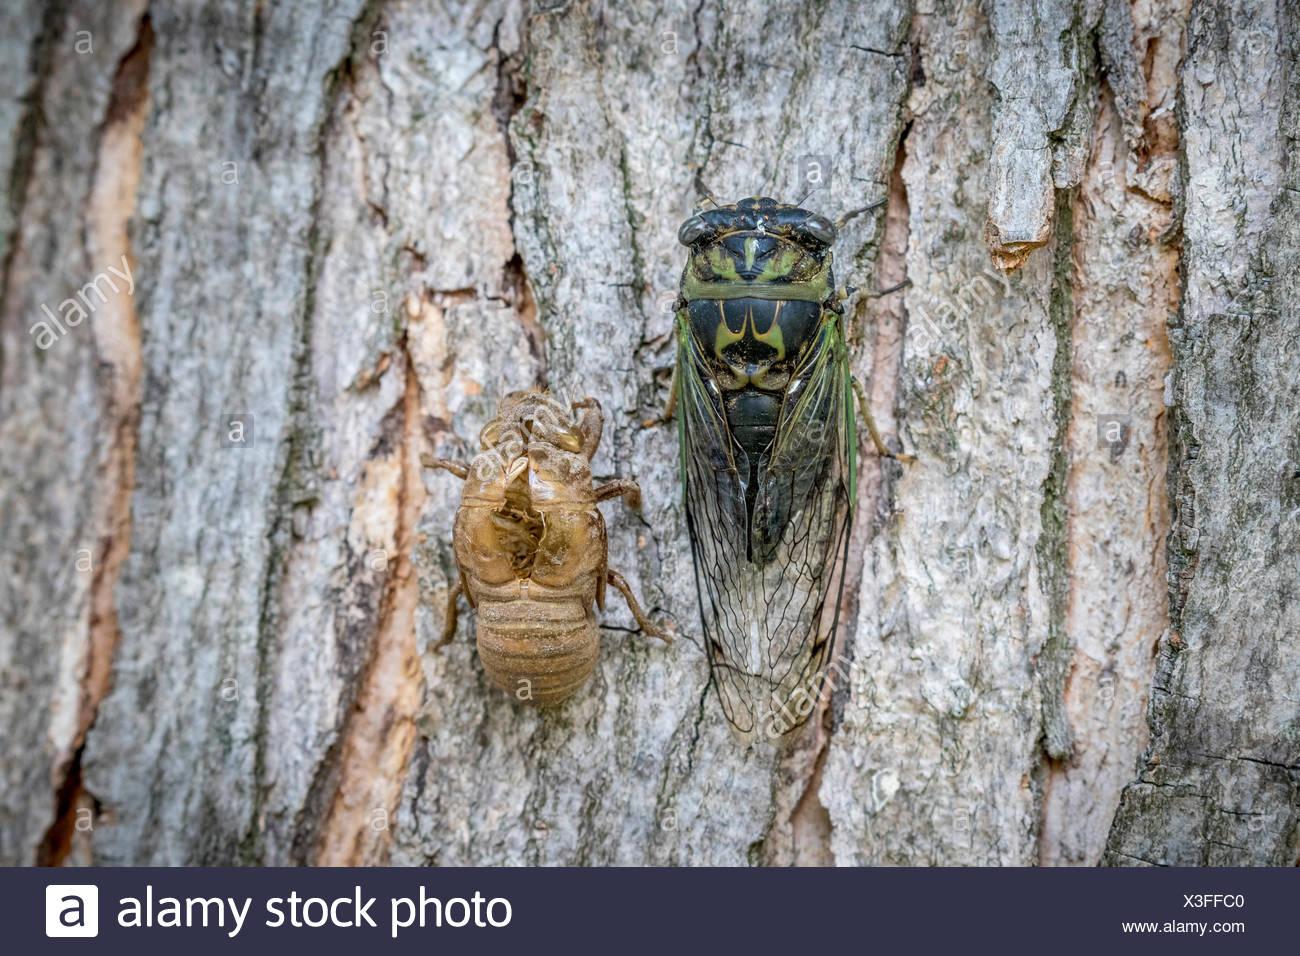 Dog-day Cicada (Neotibicen canicularis) beside a molted cicada exoskeleton, Toronto, Ontario, Canada Stock Photo